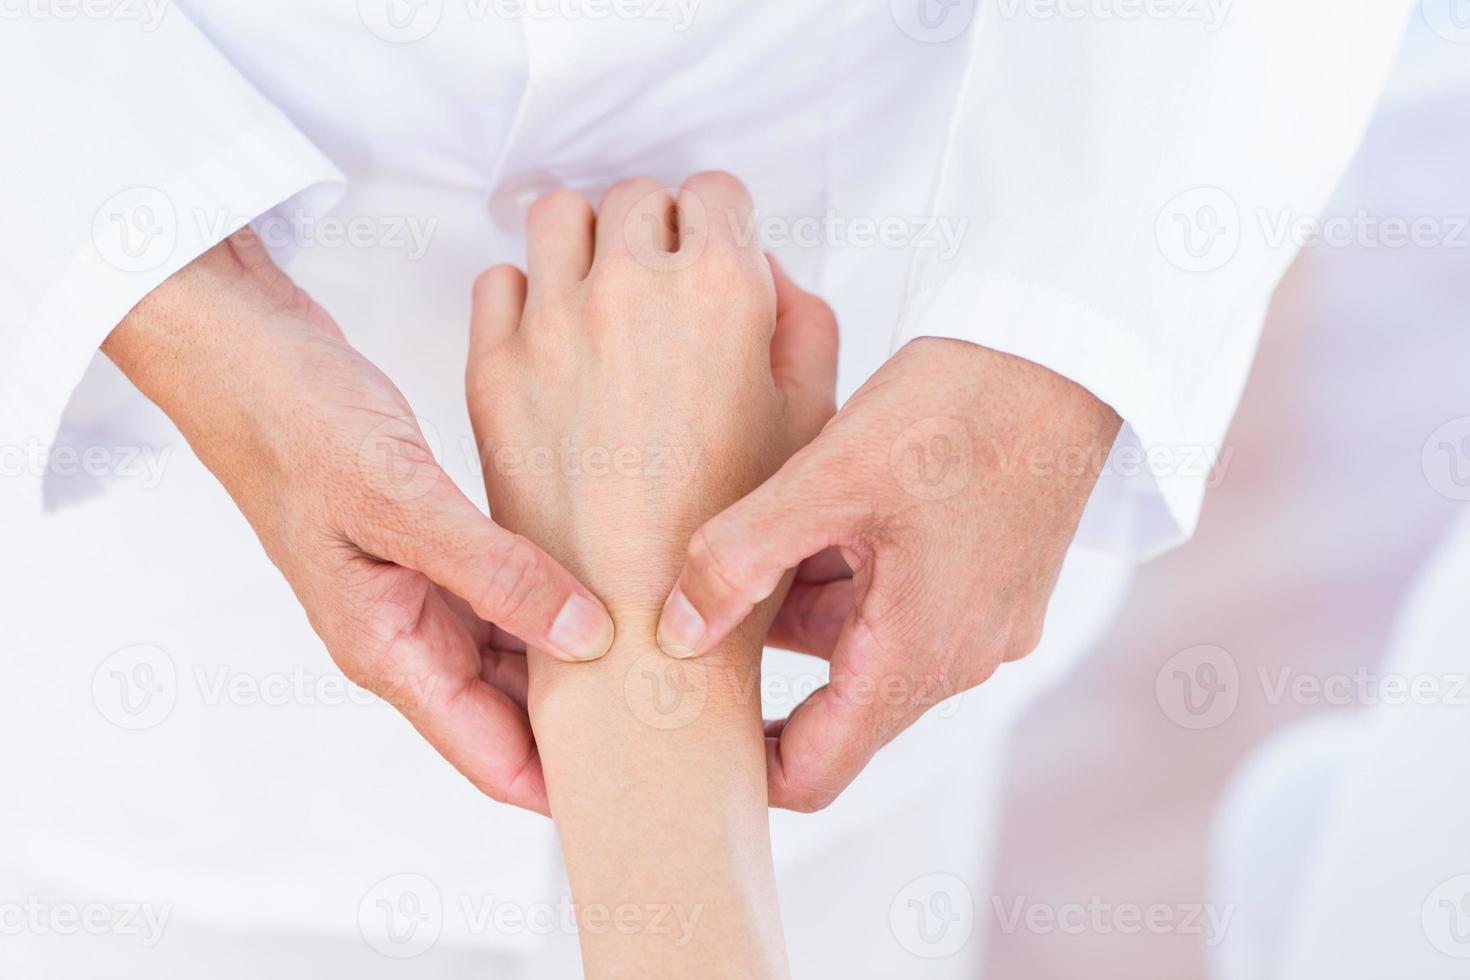 médico examinando o pulso de pacientes foto